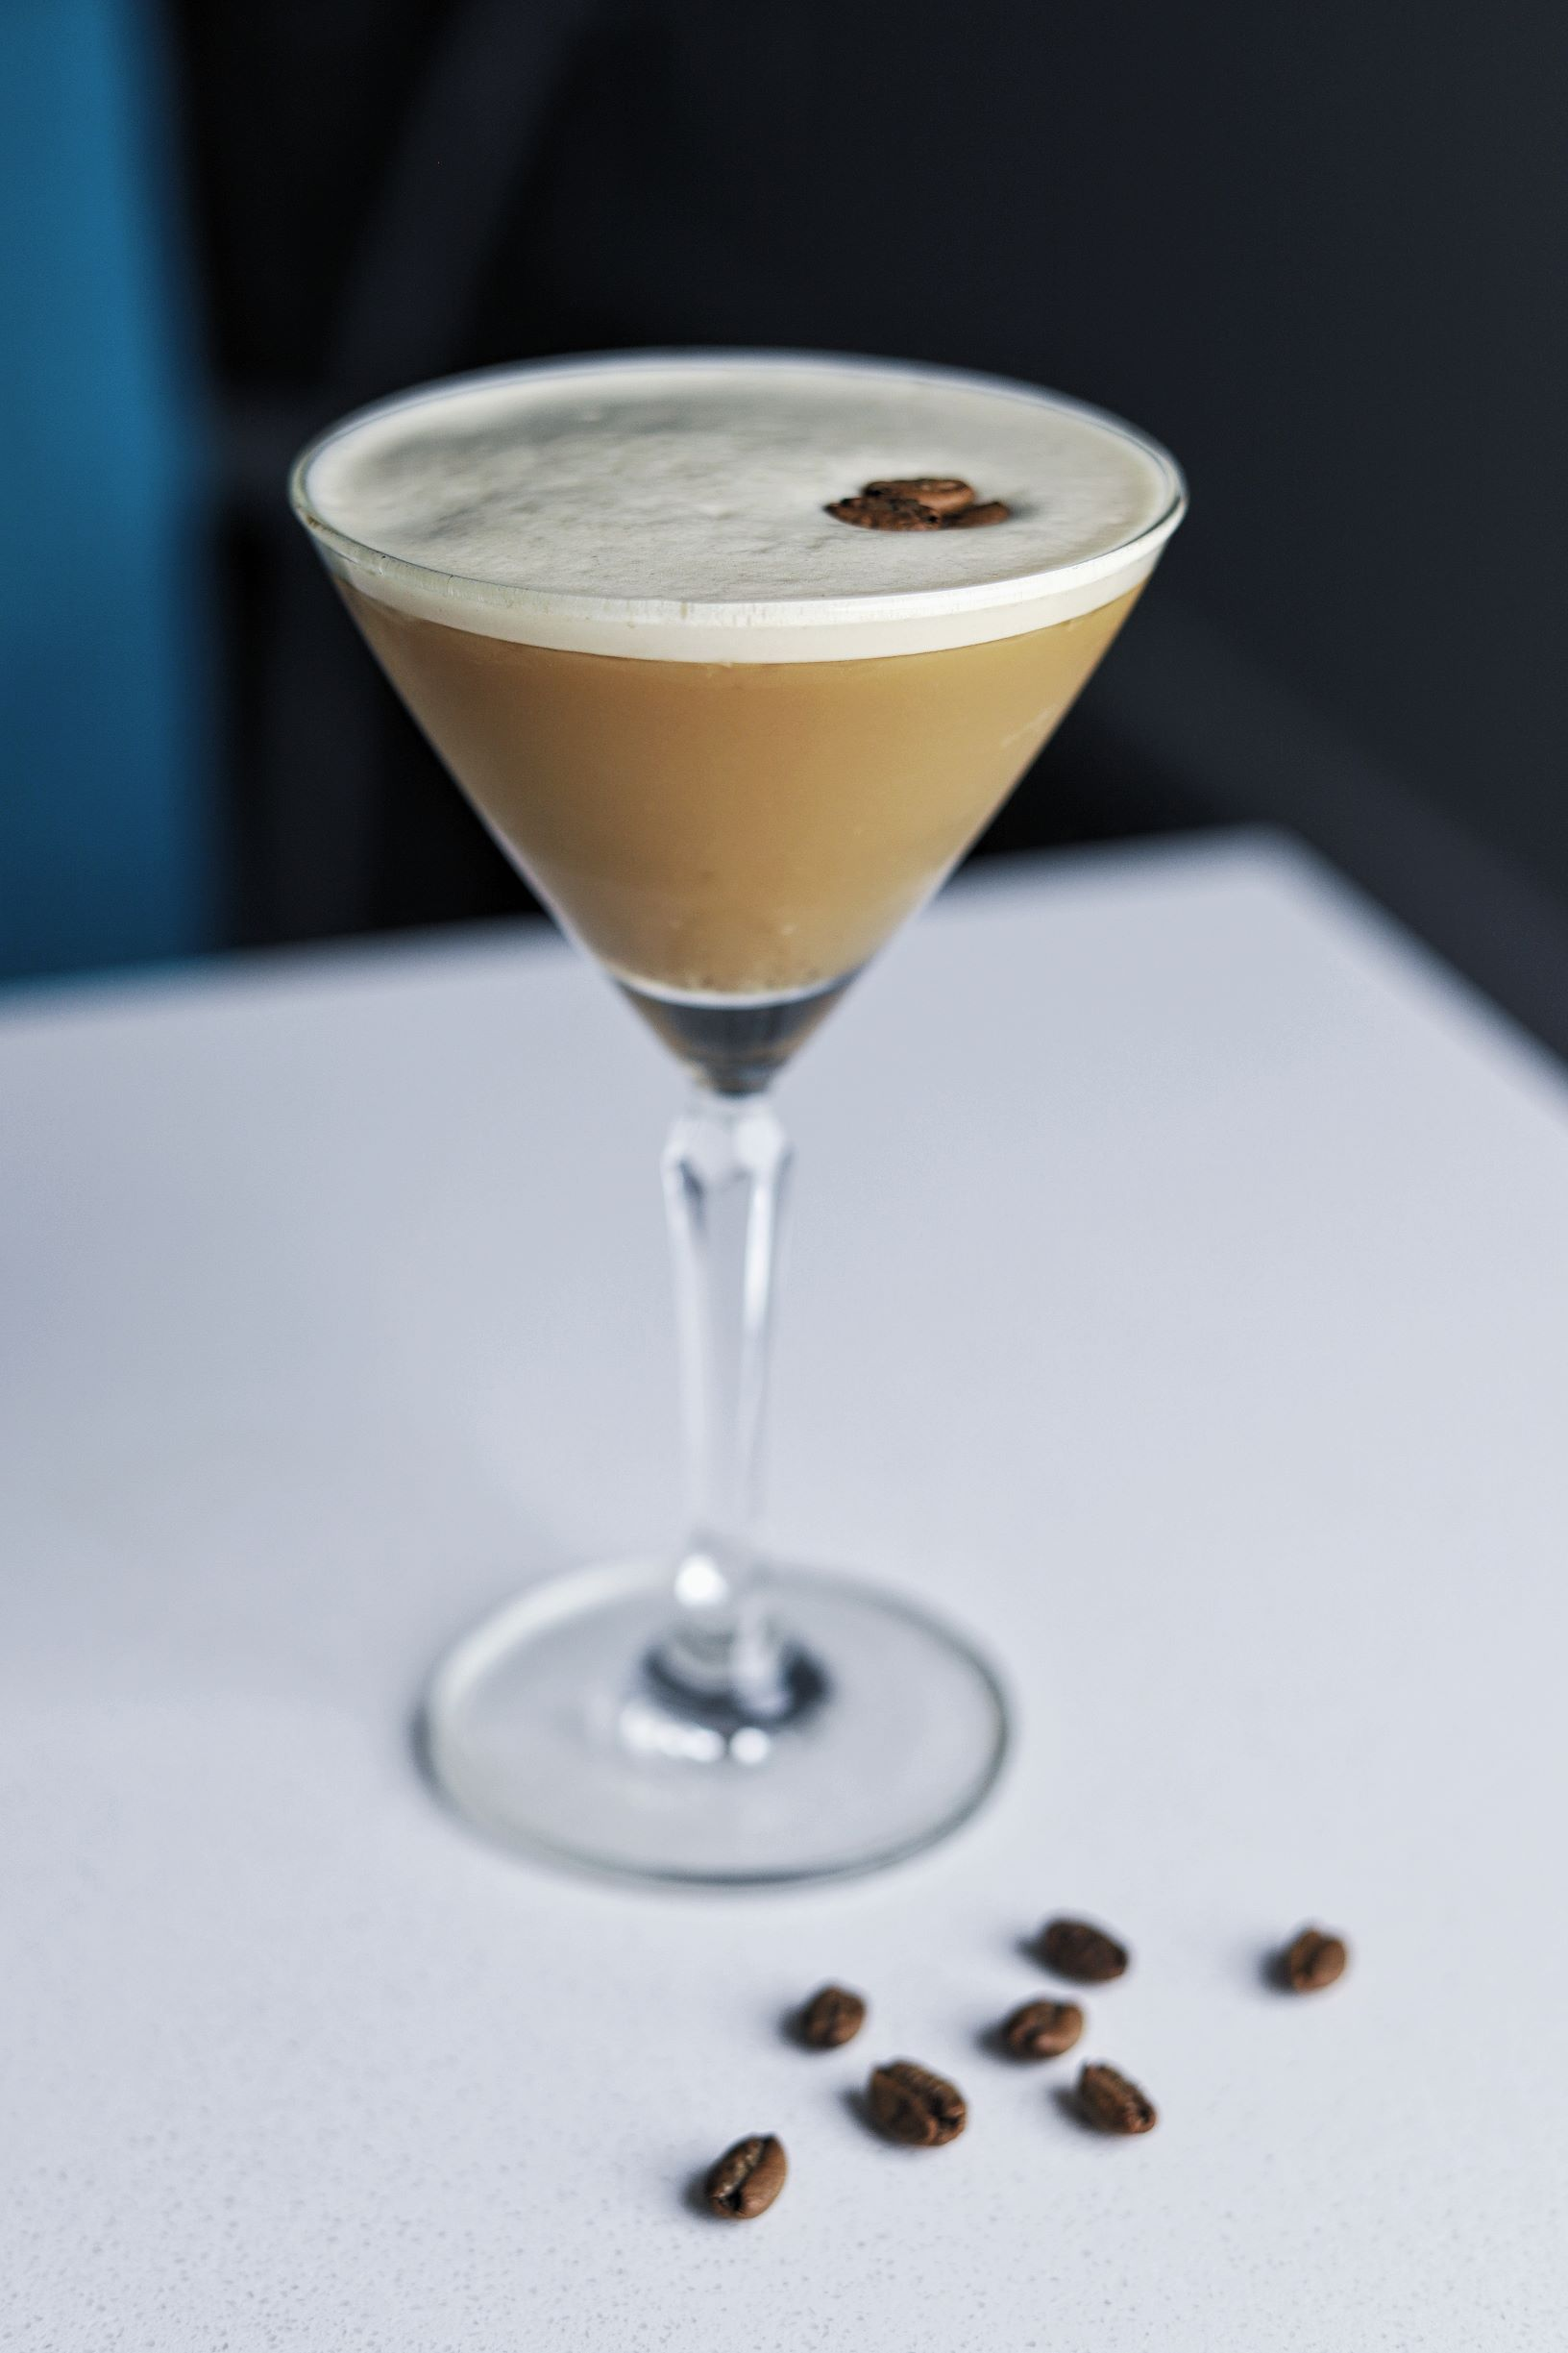 LeClair Organics Liberica specialty coffee,, brandy espresso martini recipe, coffee cocktails 13